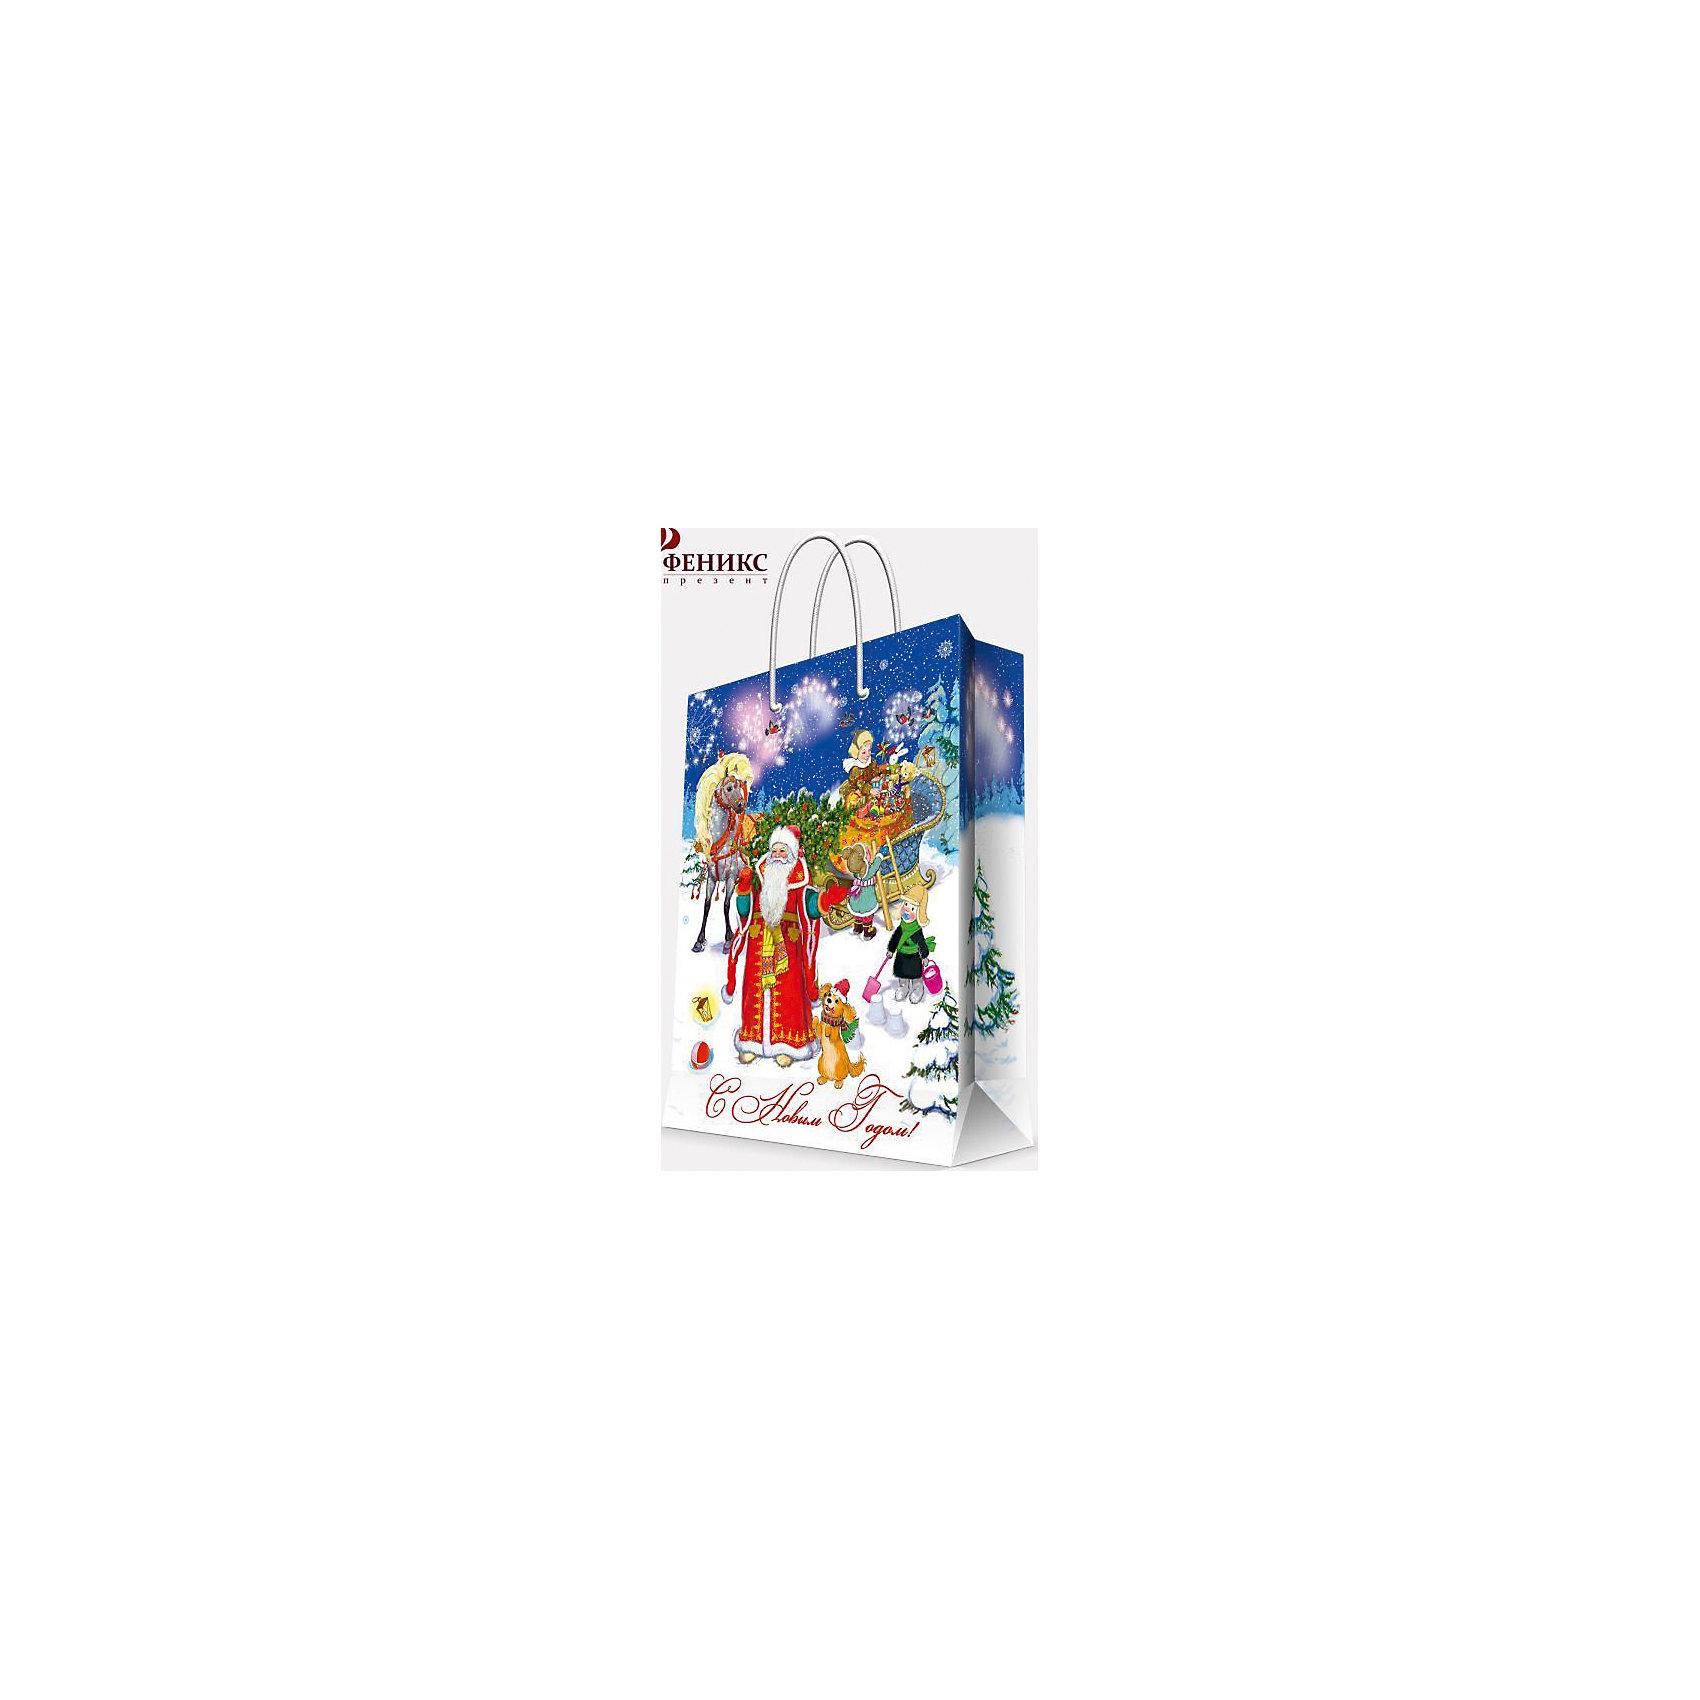 Magic Time Подарочный пакет Дед Мороз  Ёлкой 26*32,4*12,7 см magic time подарочный пакет новогодняя лампа 26 32 4 12 7 см